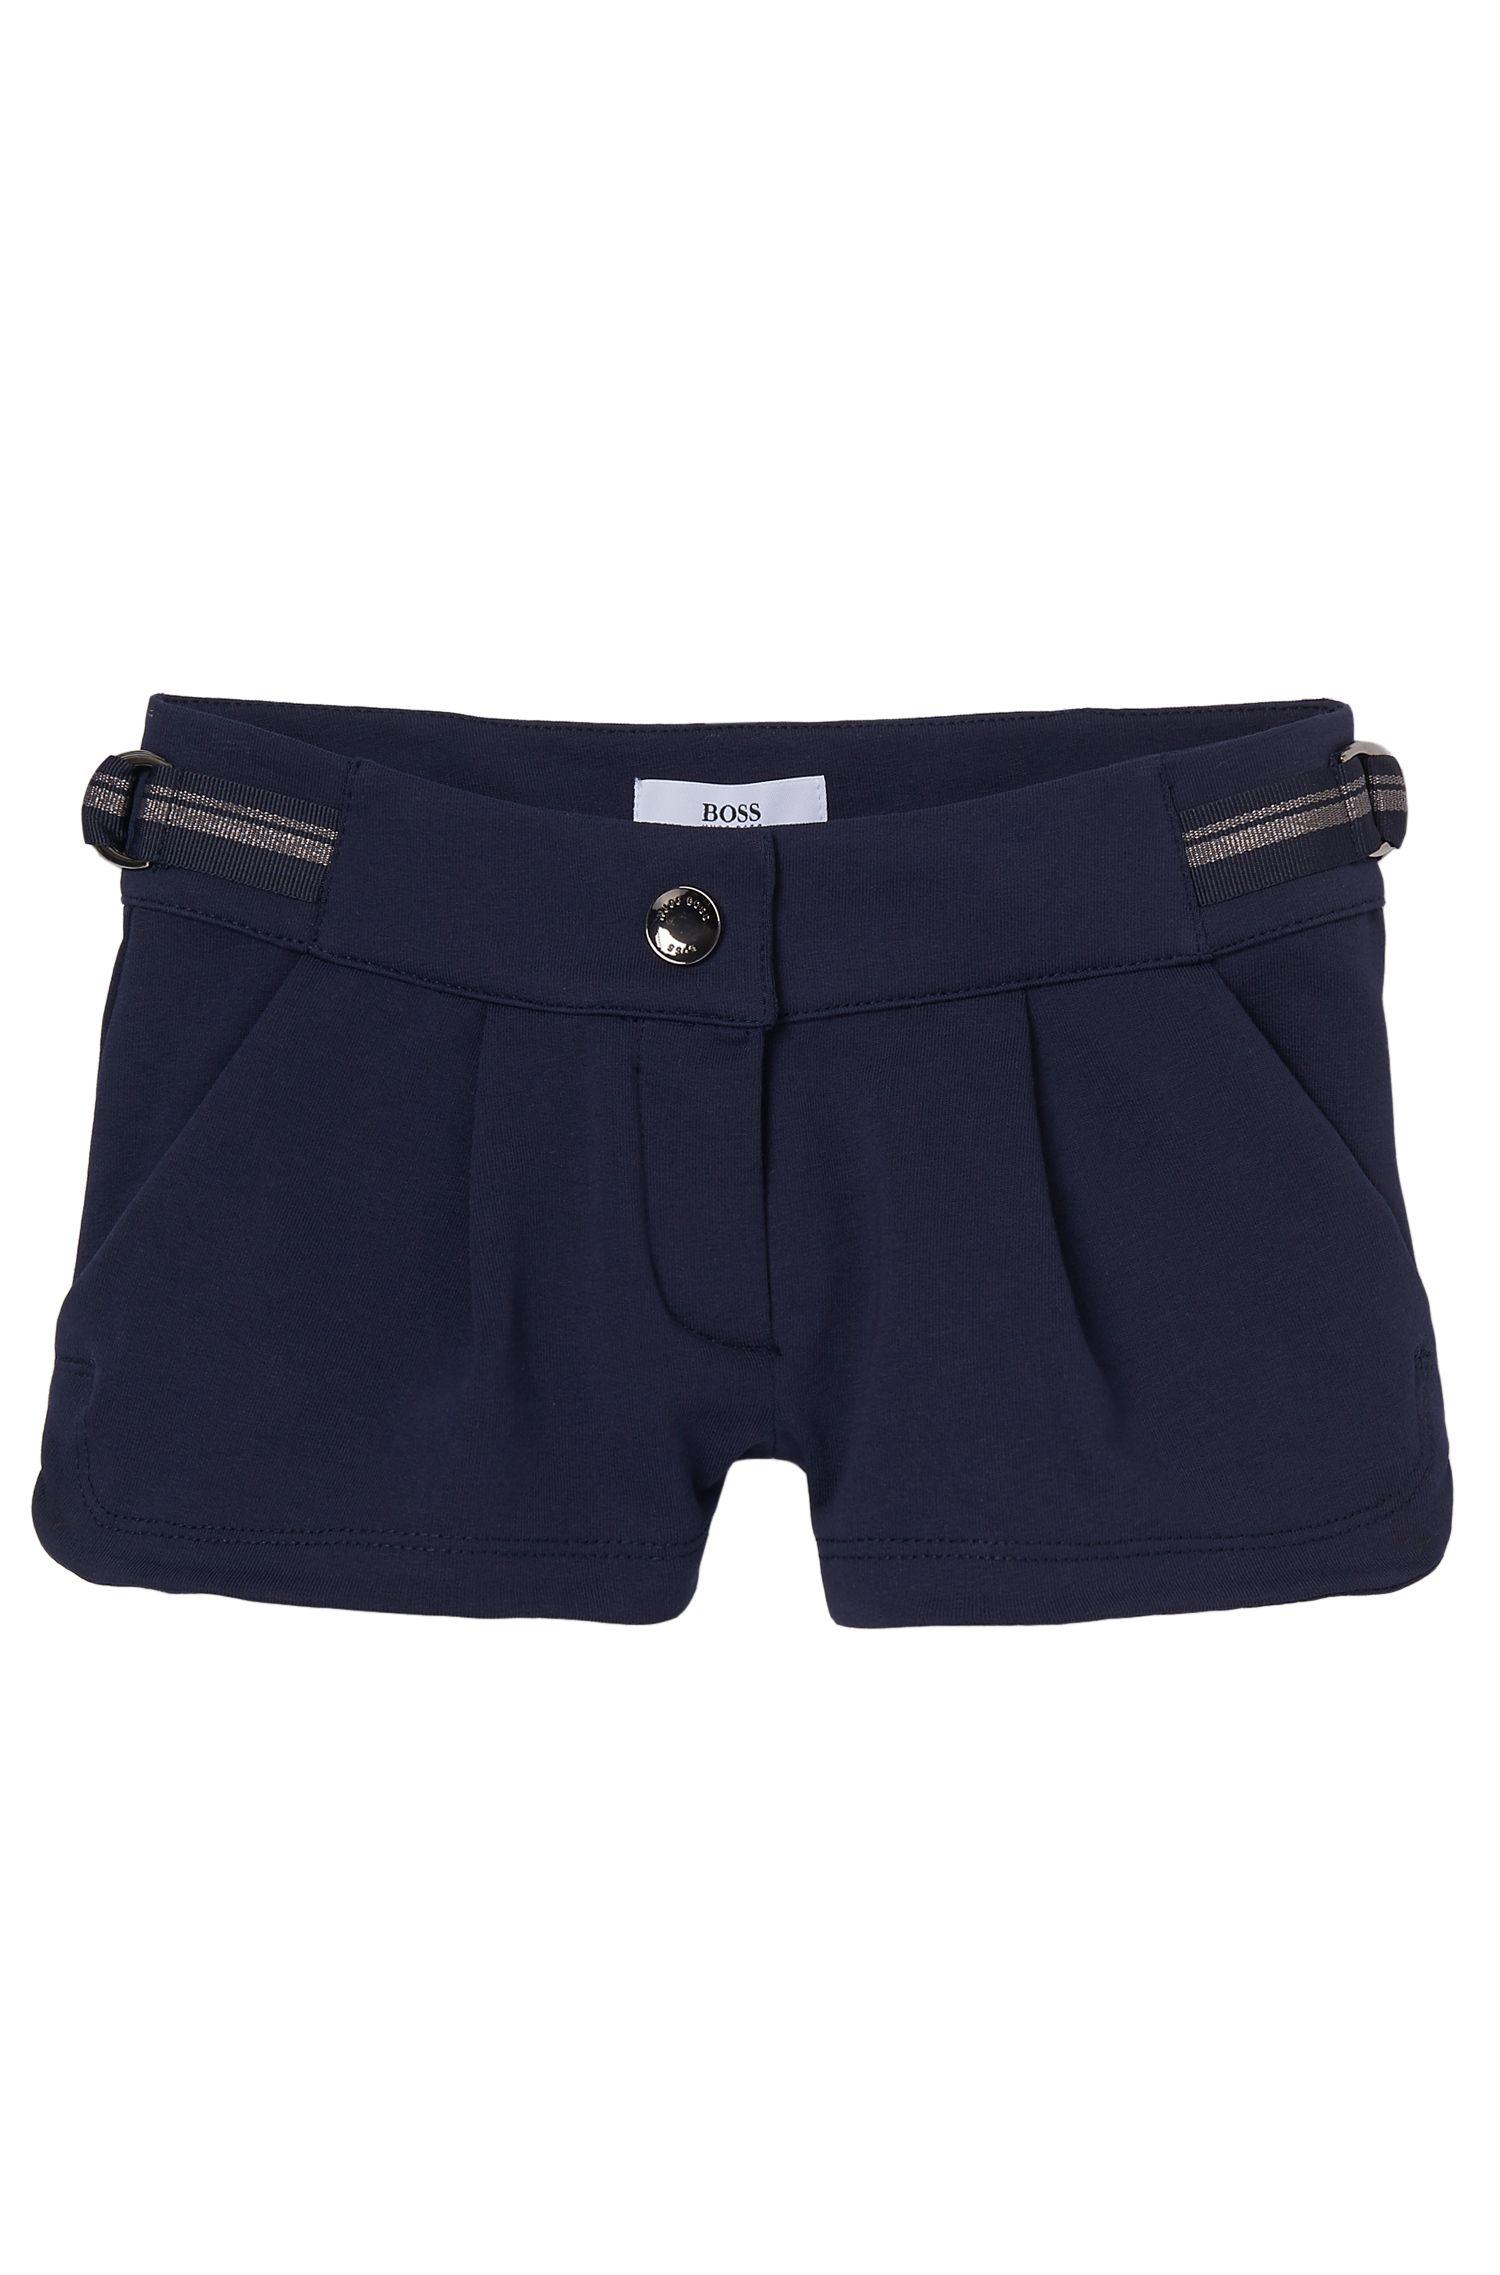 'J14173'   Girls Cotton Fleece Shorts